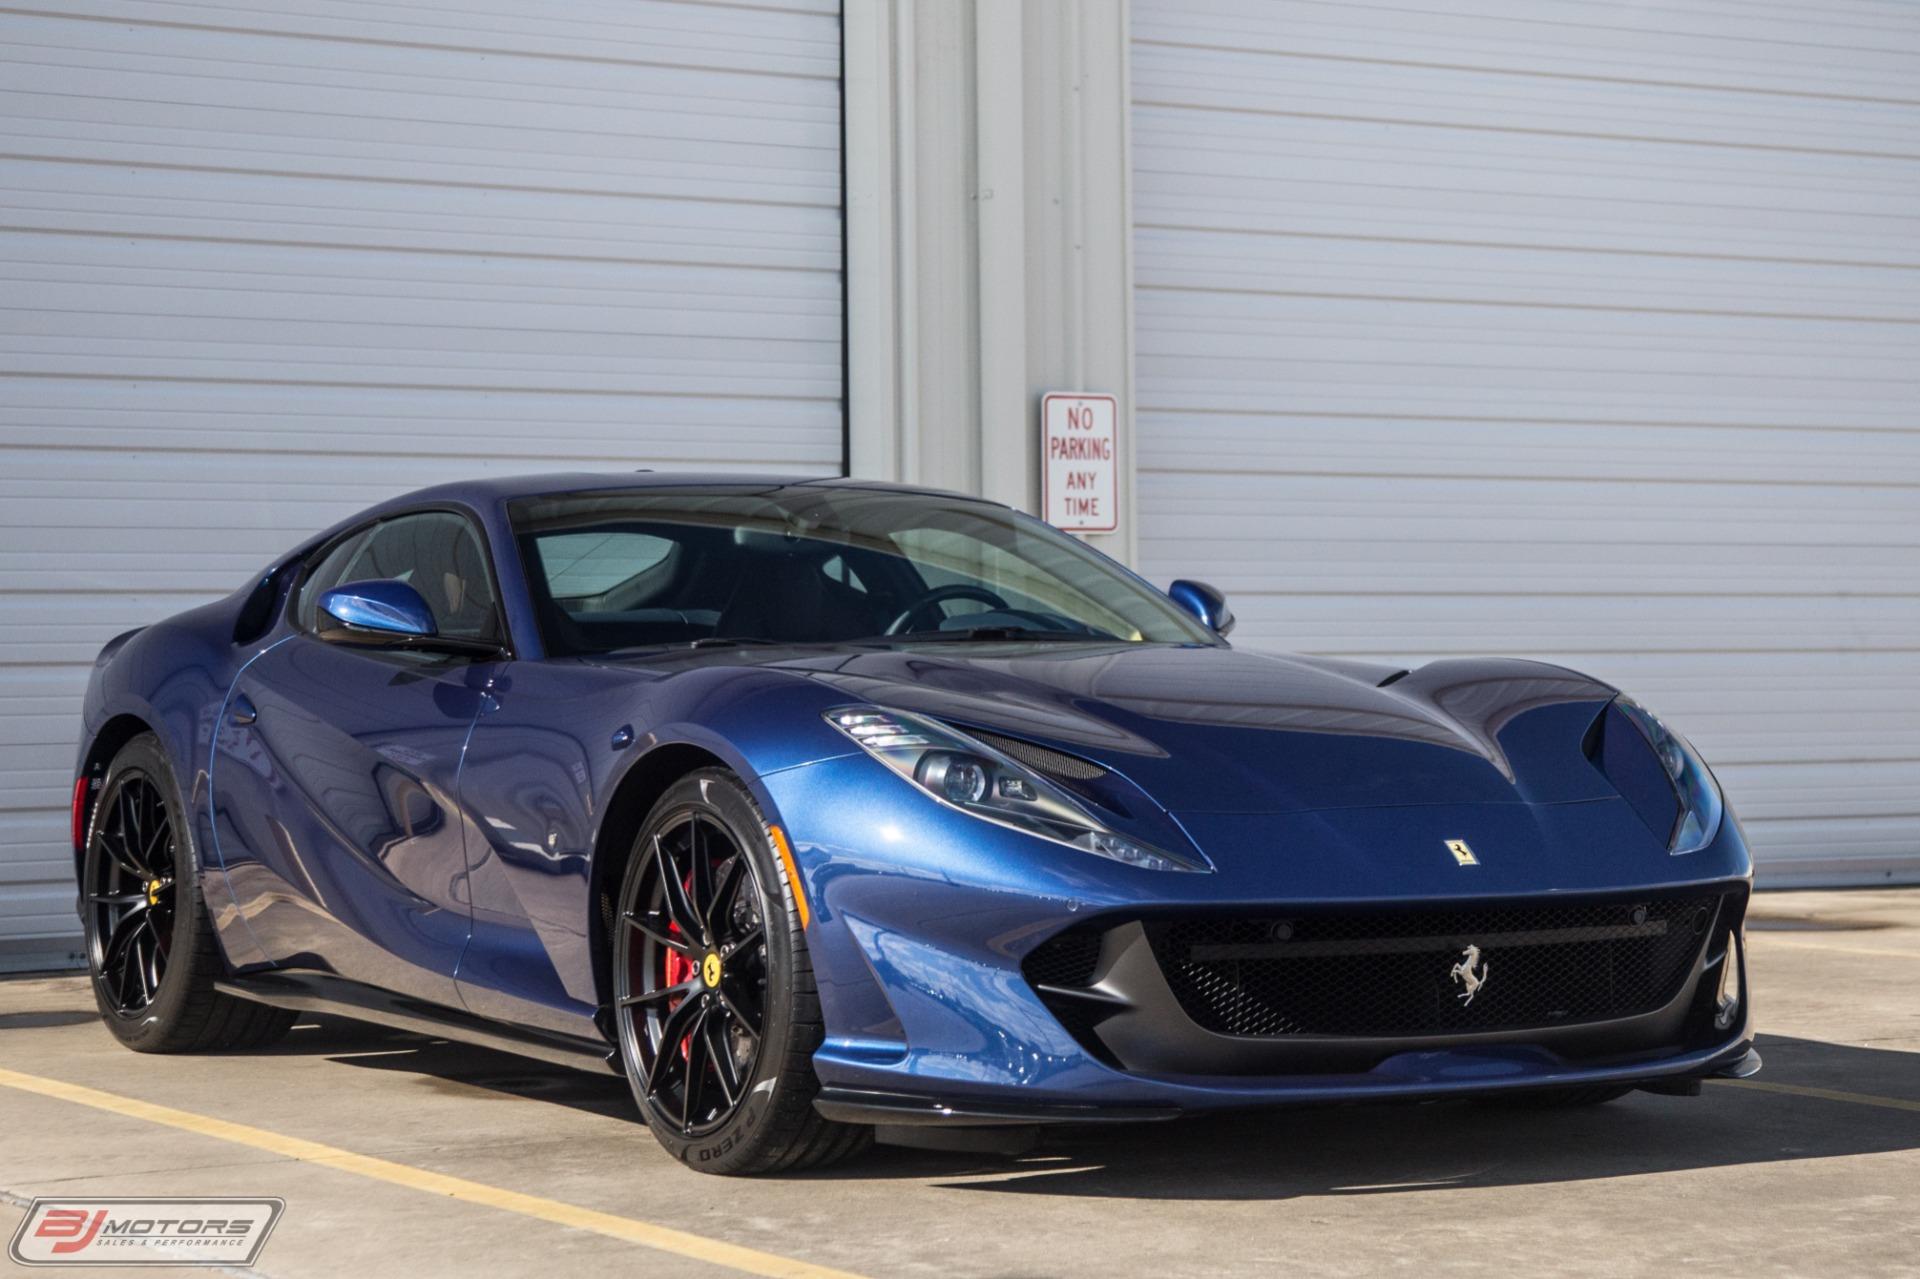 Used 2018 Ferrari 812 Superfast Tdf Blue W Blue Sterling Chocolate For Sale 414 000 Bj Motors Stock 2j0235471